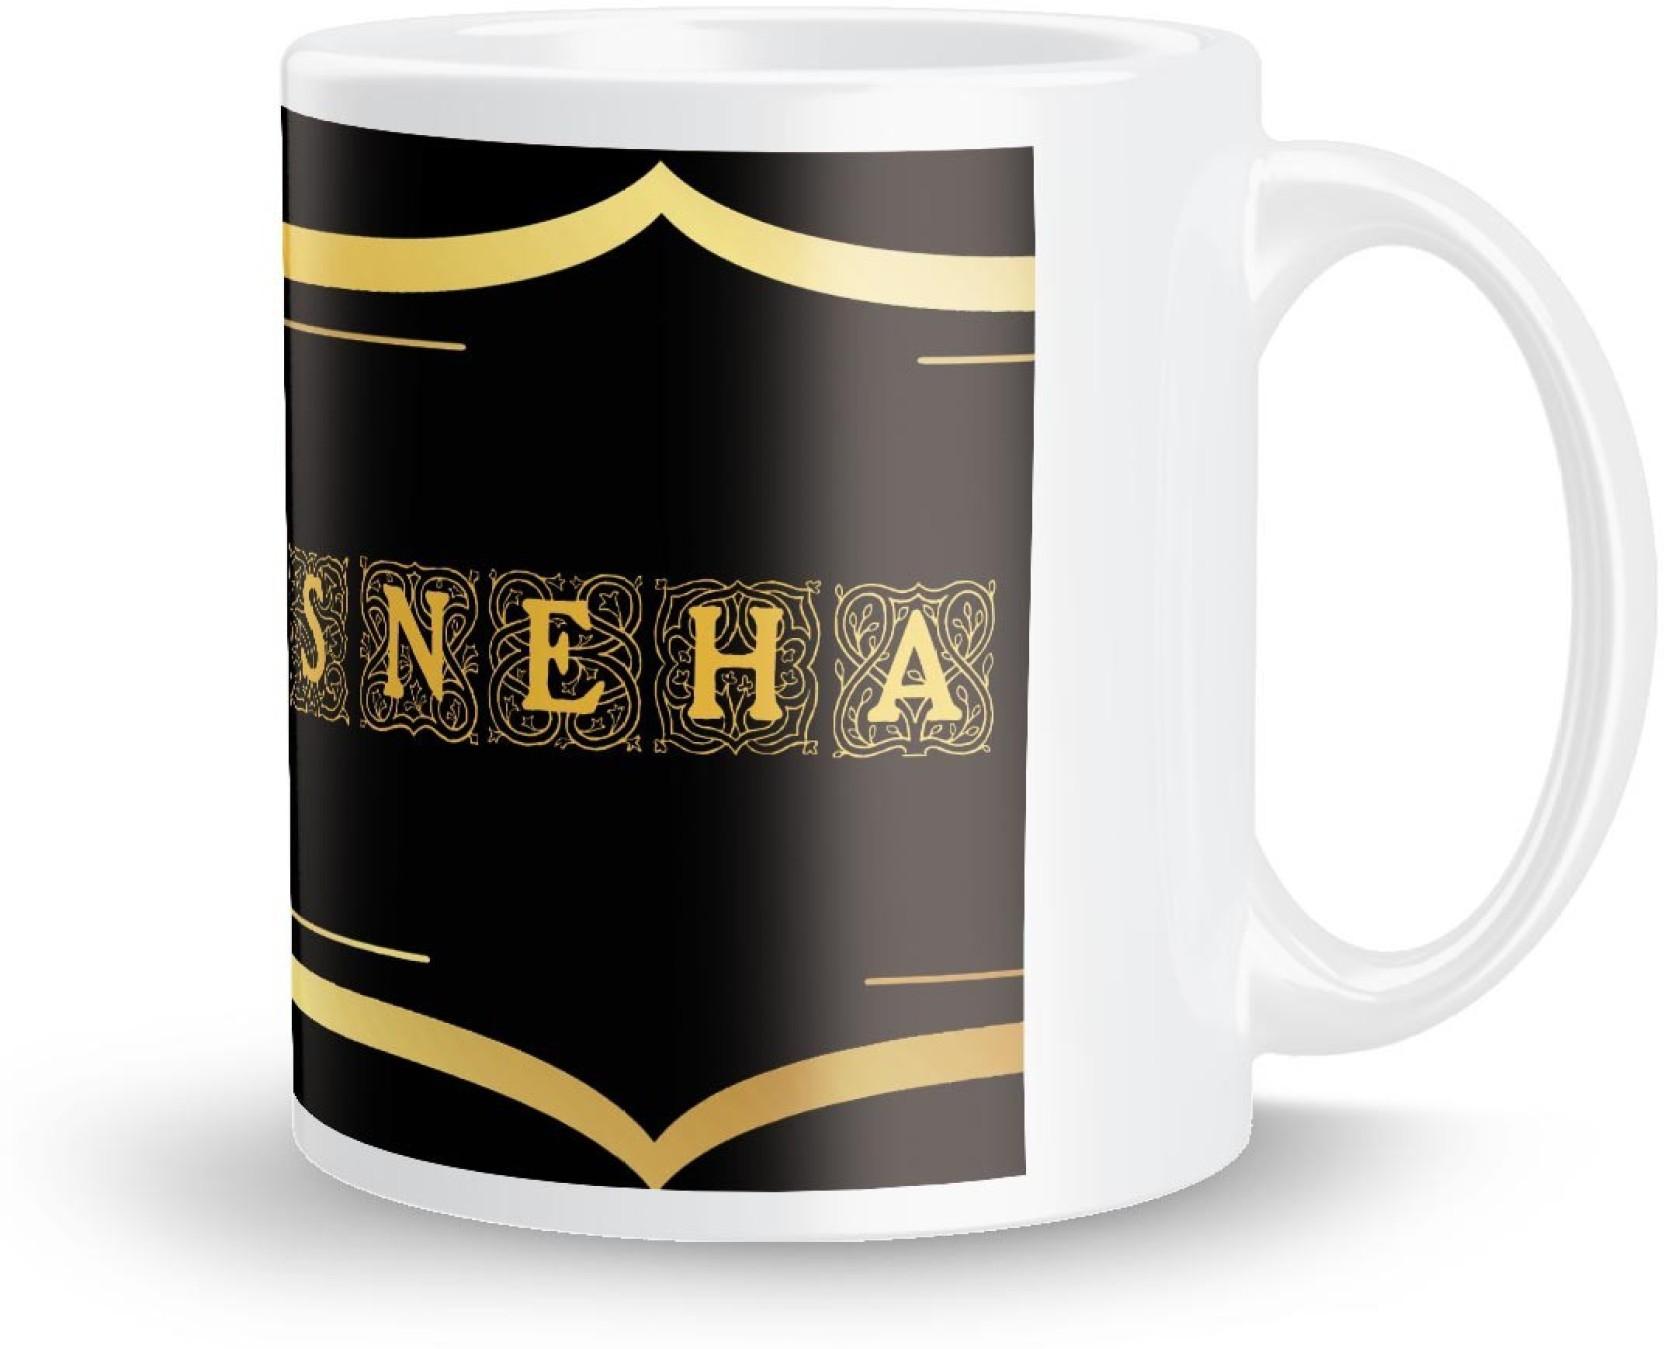 Download Wallpaper Name Sneha - 1-posterchacha-sneha-name-tea-and-coffee-mug-for-gift-and-self-original-imaejsaqqgh3hcjv  Snapshot_782170.jpeg?q\u003d90